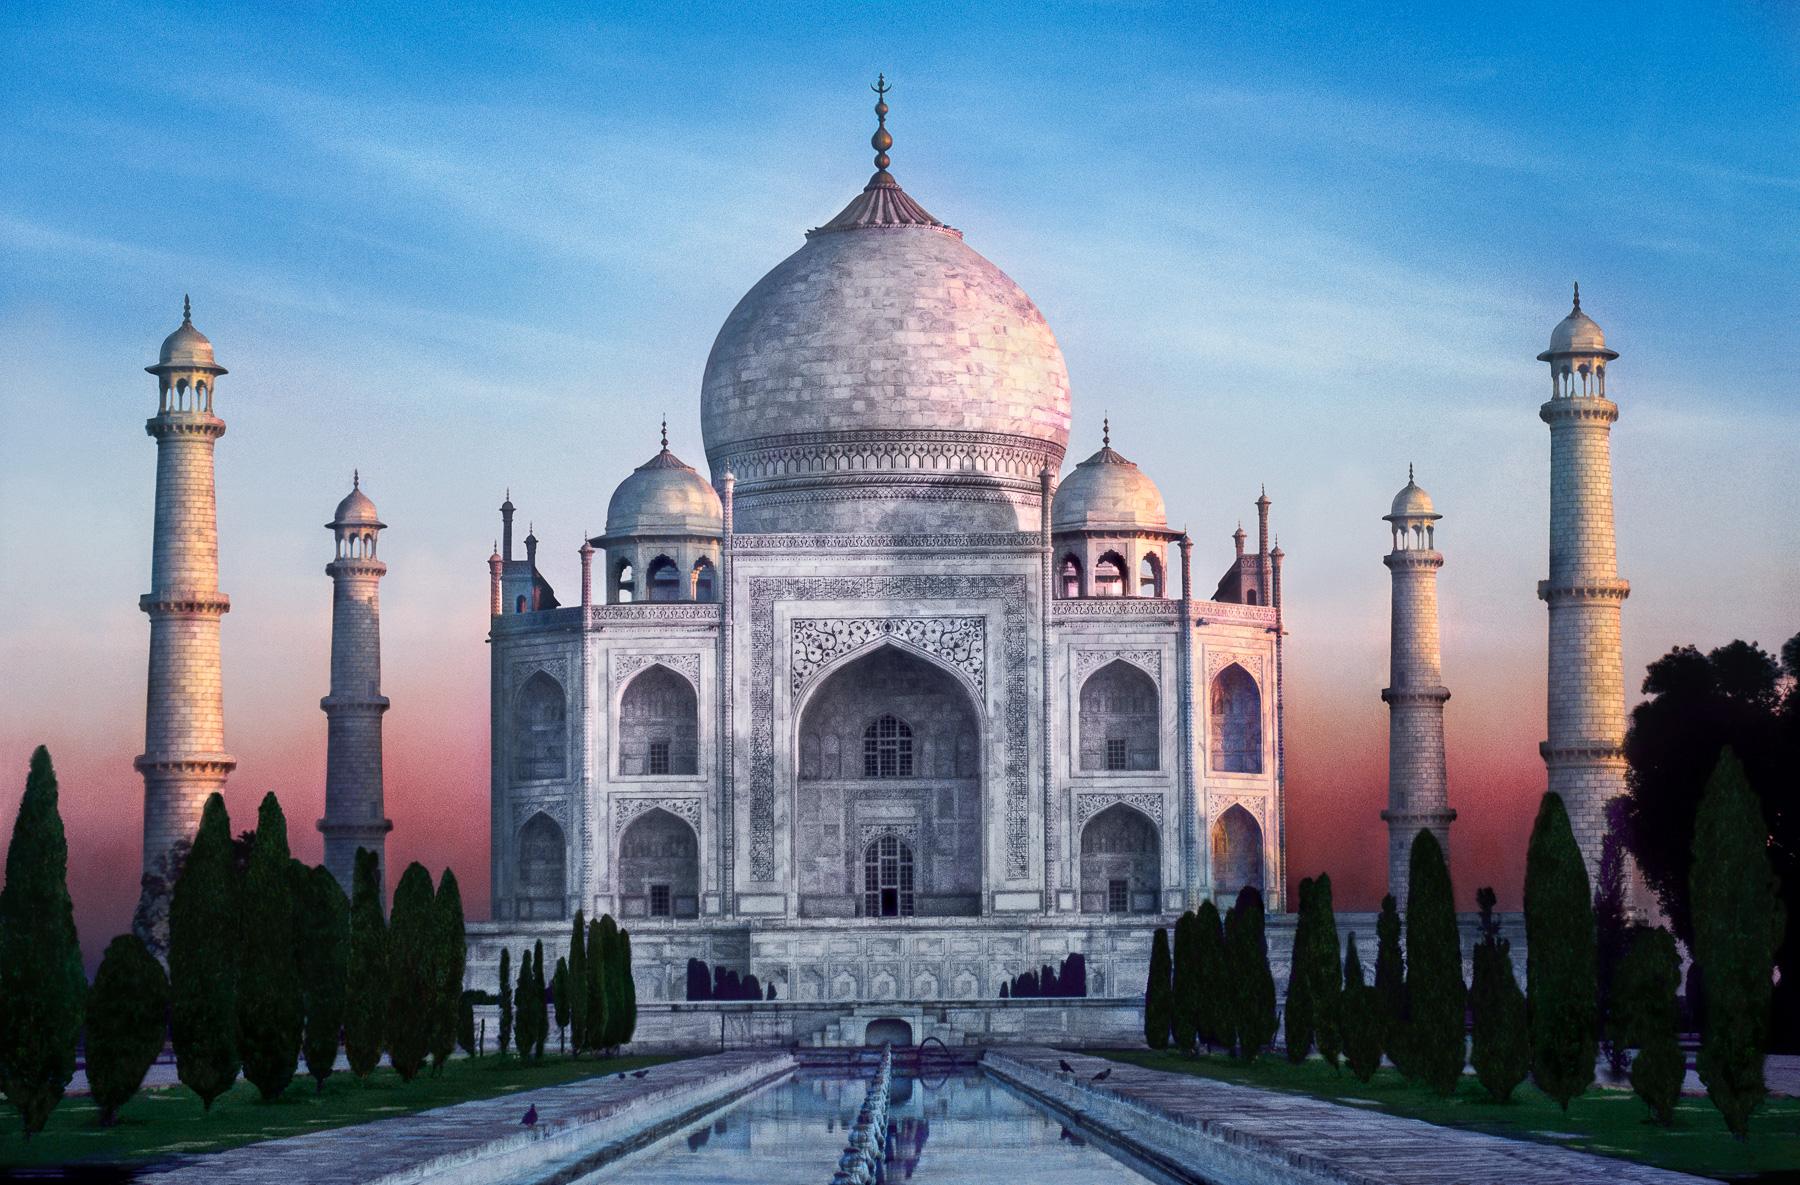 A photograph of Taj Mahal at dawn, Agra, India